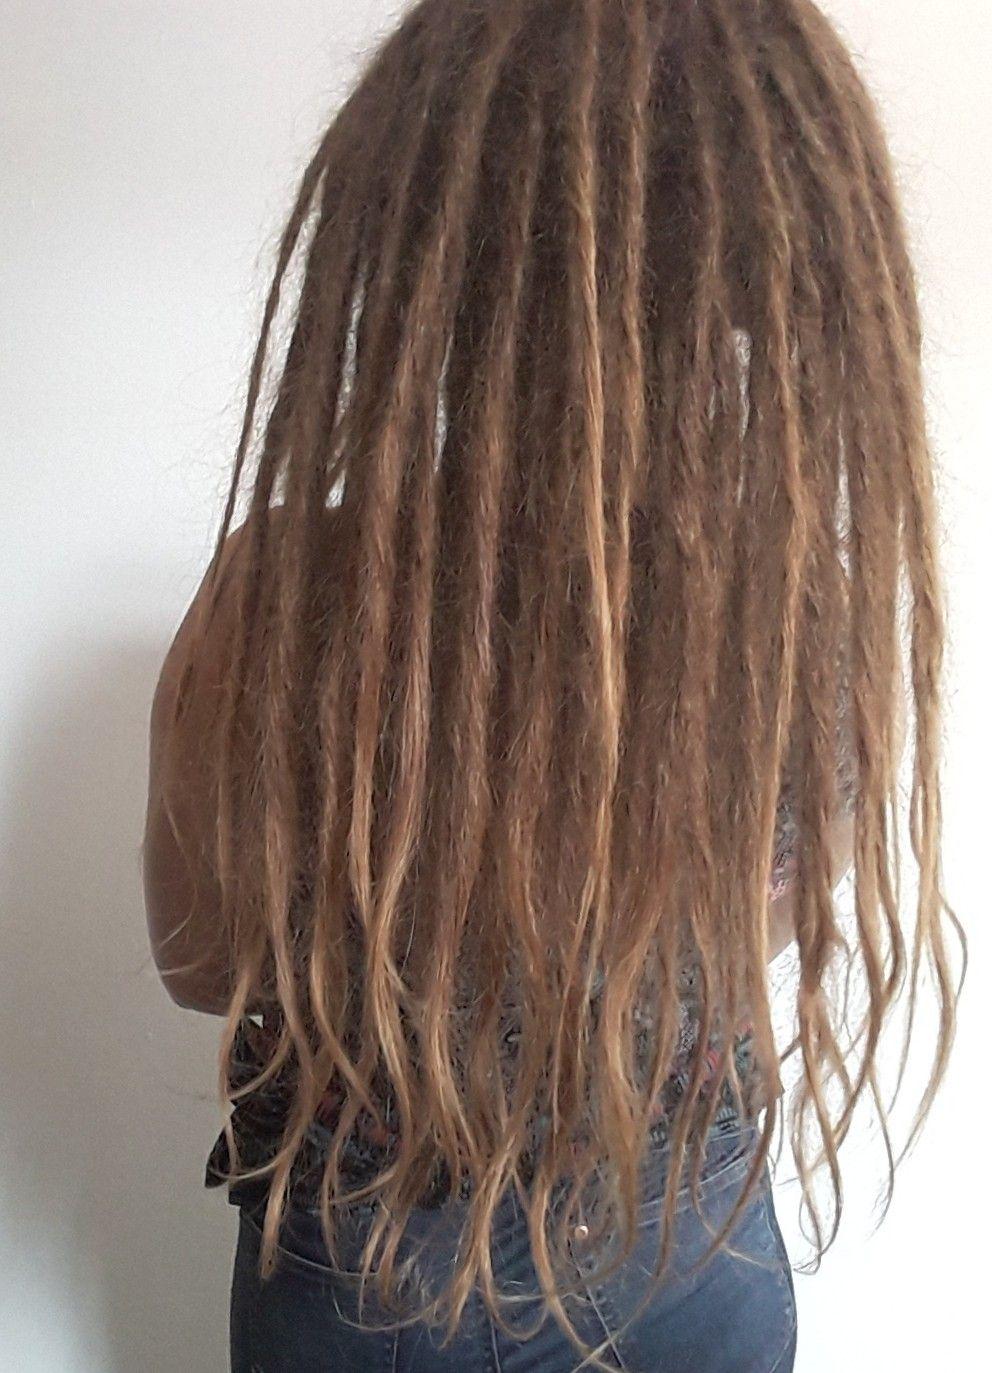 My 1 Day Old Dreads Emily08072002 Dreadlocks Girl Hair Styles Dread Hairstyles